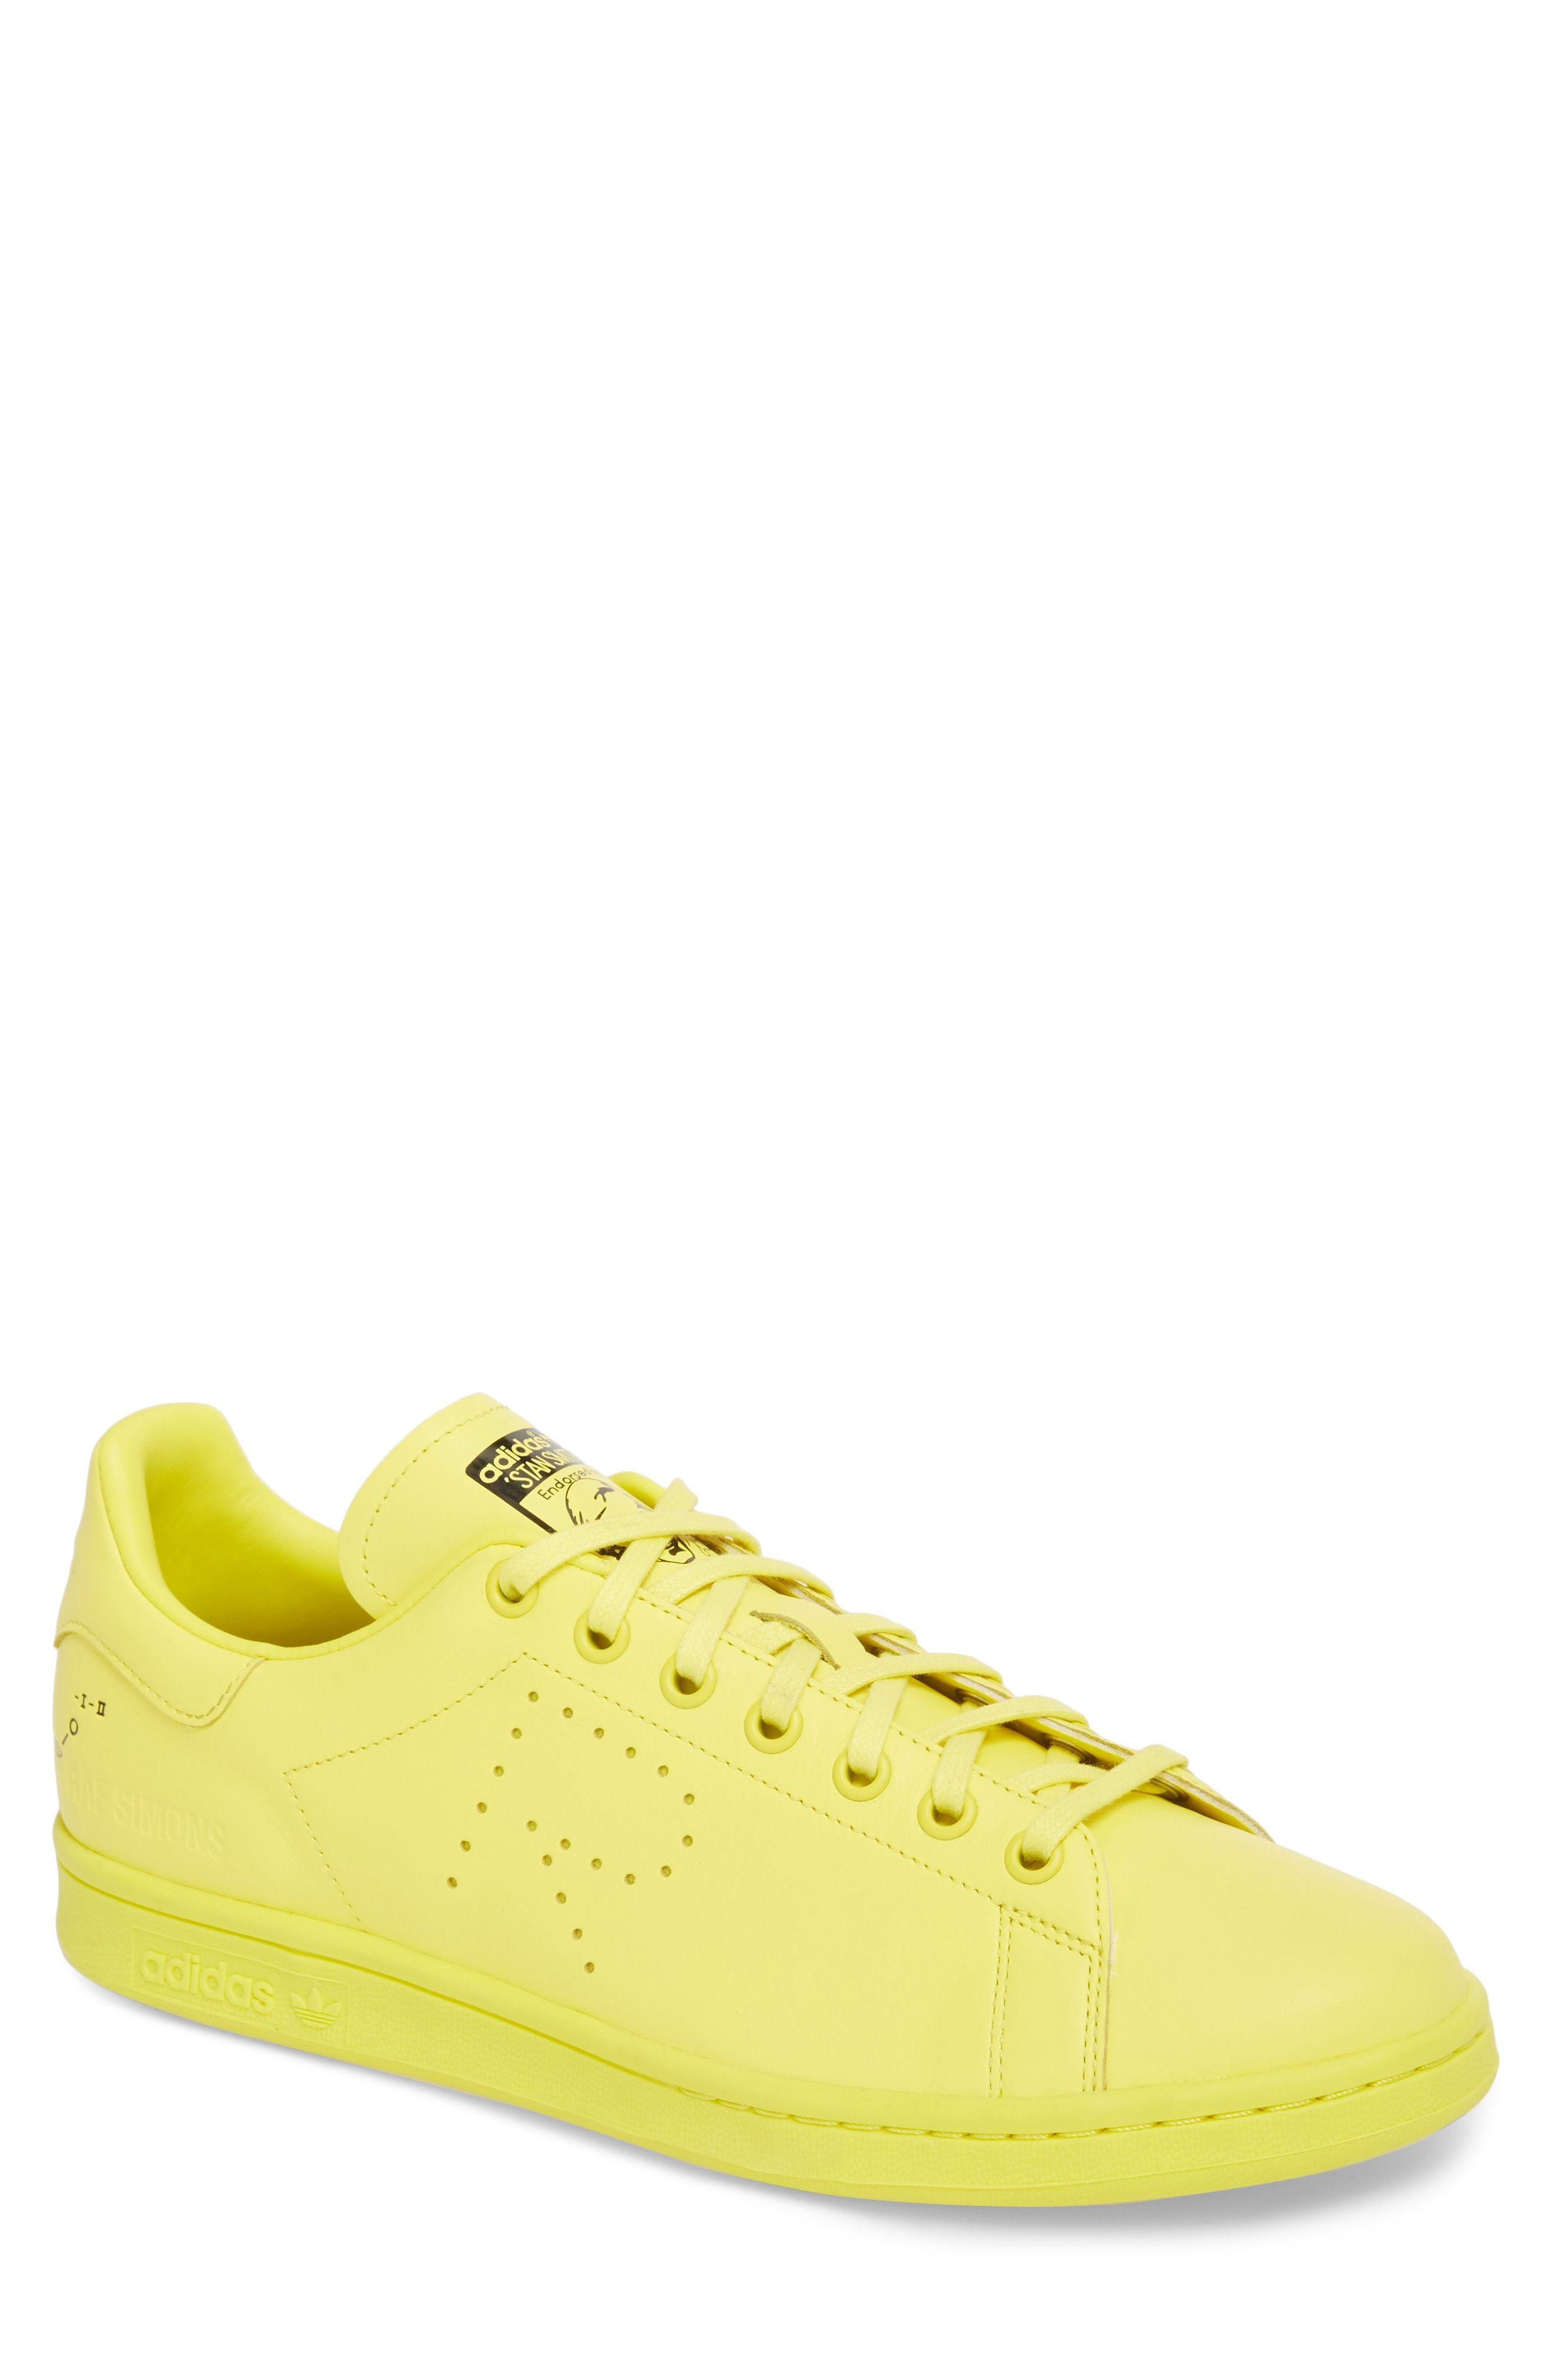 2b733655109 ... RAF SIMONS BY ADIDAS Adidas By Raf Simons Stan Smith Sneaker